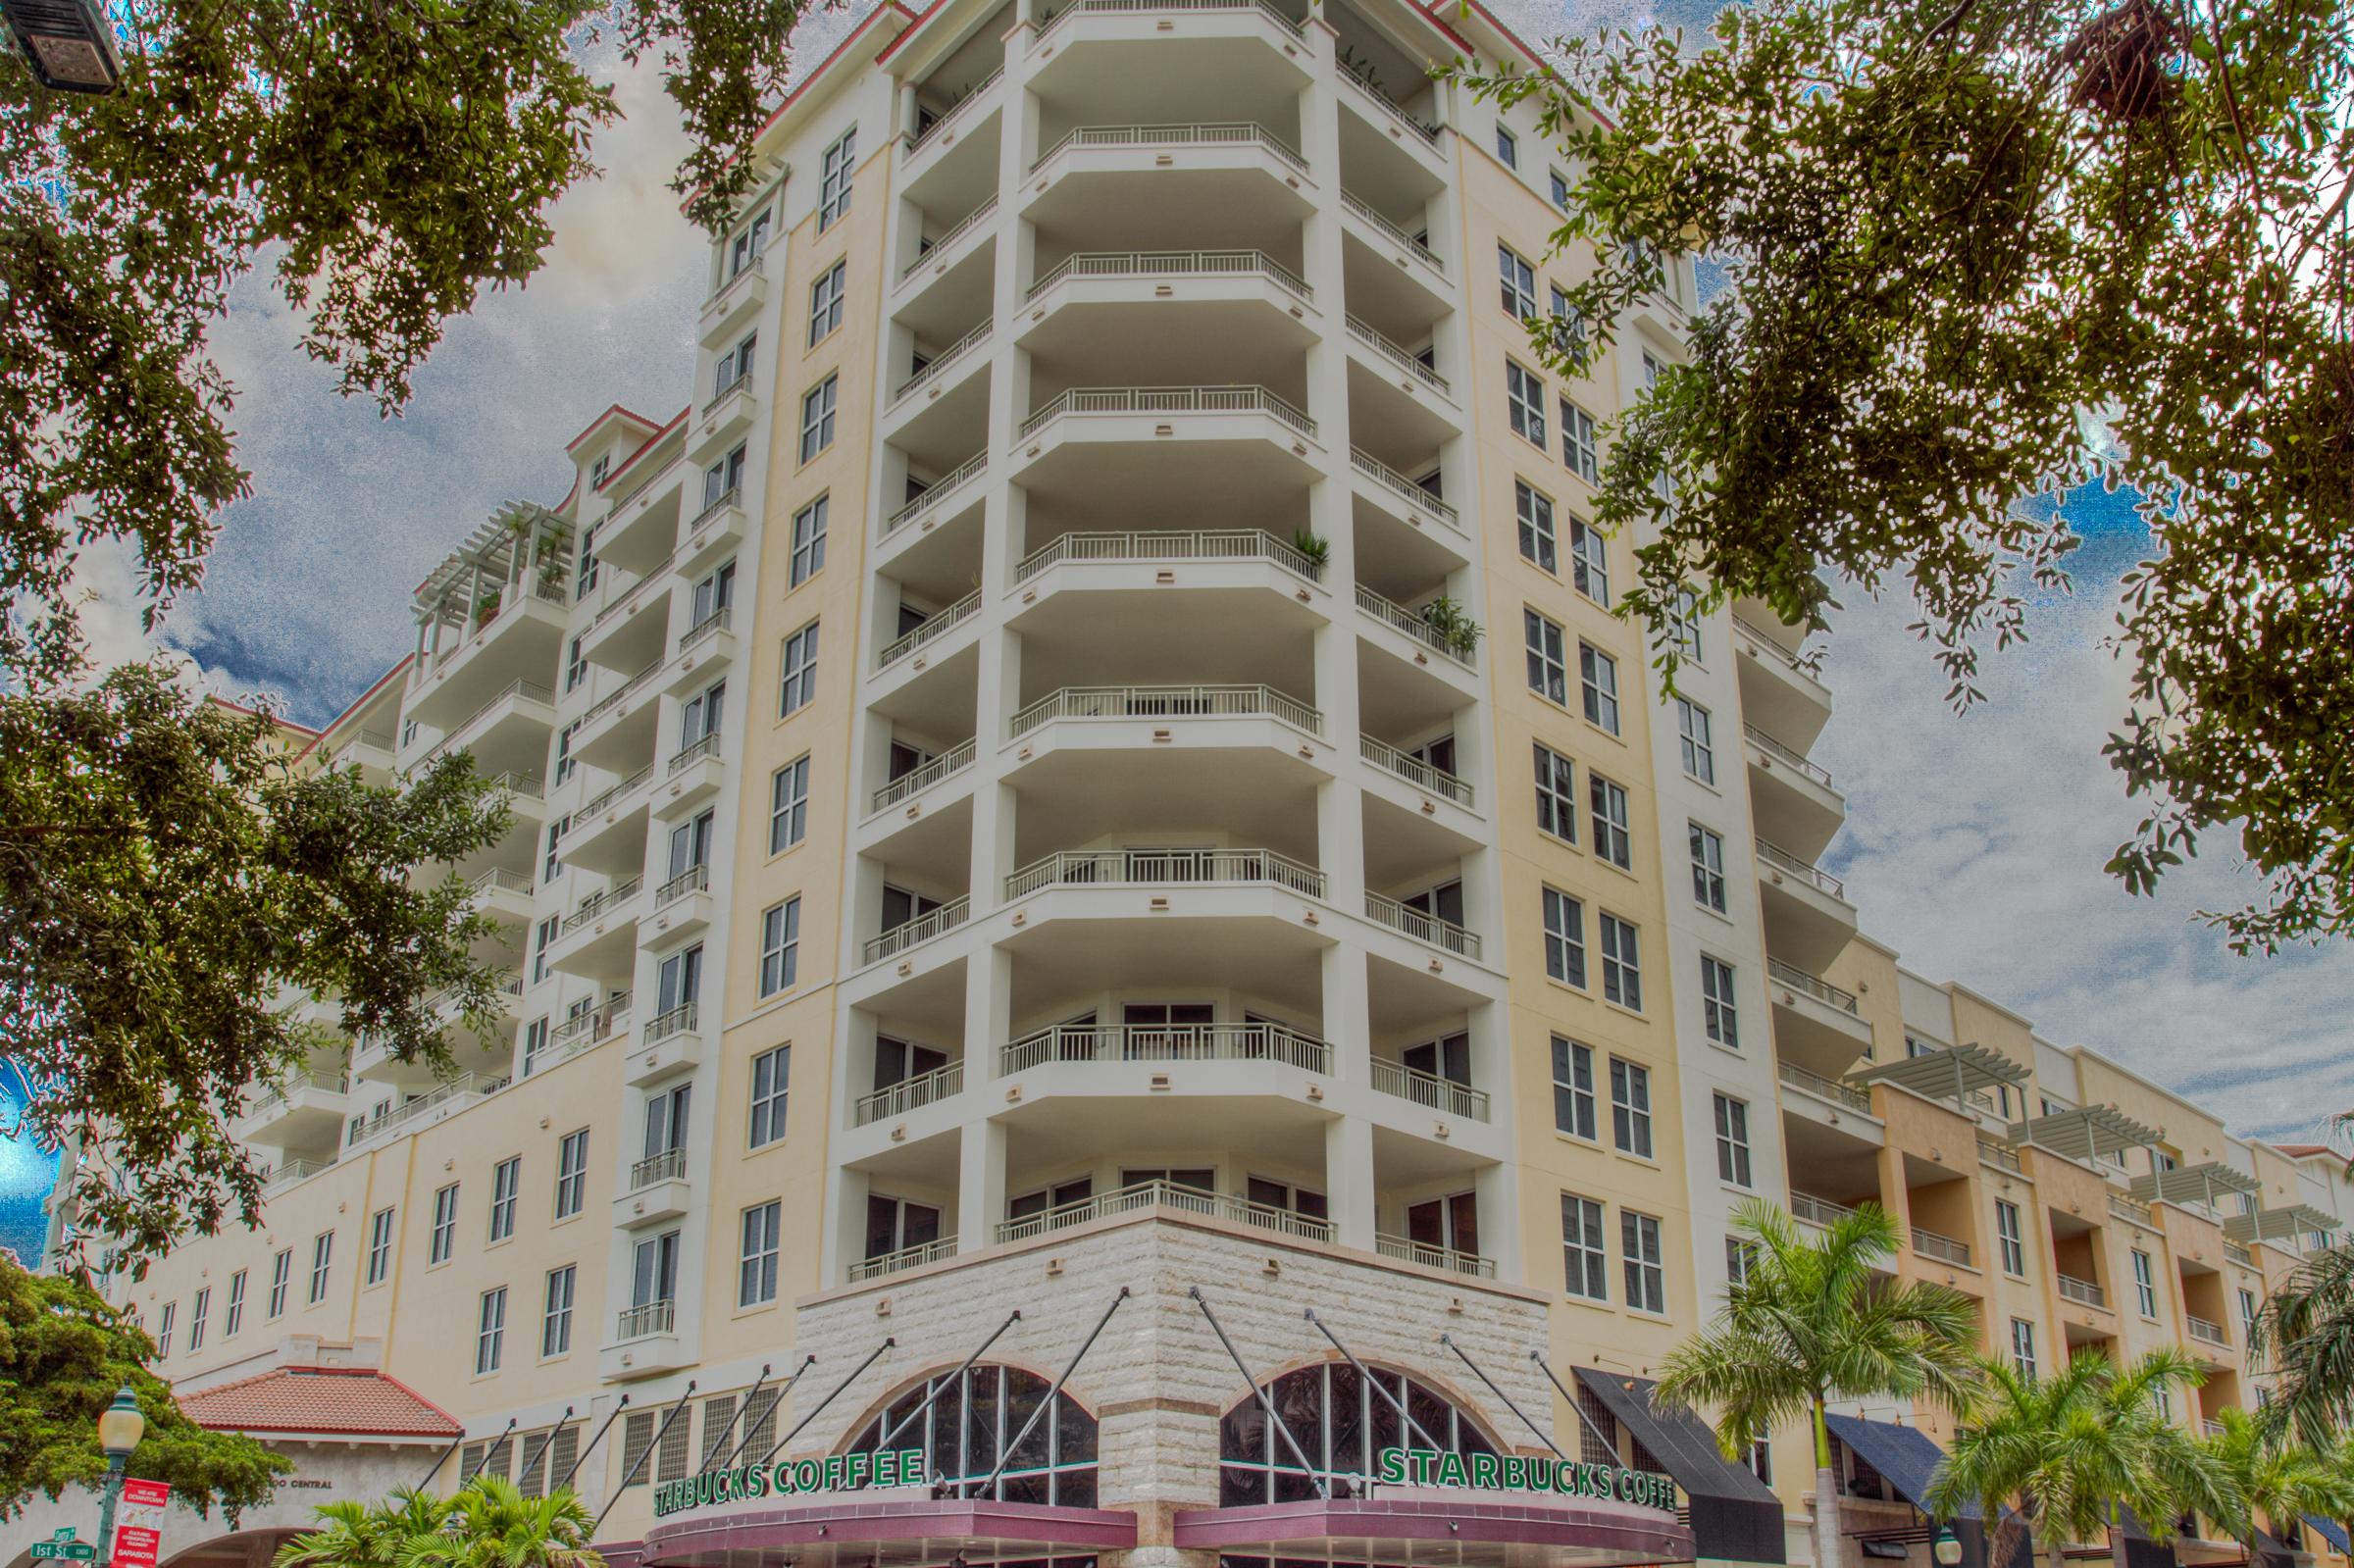 Condo Vacation Rentals Sarasota S Best Rentals